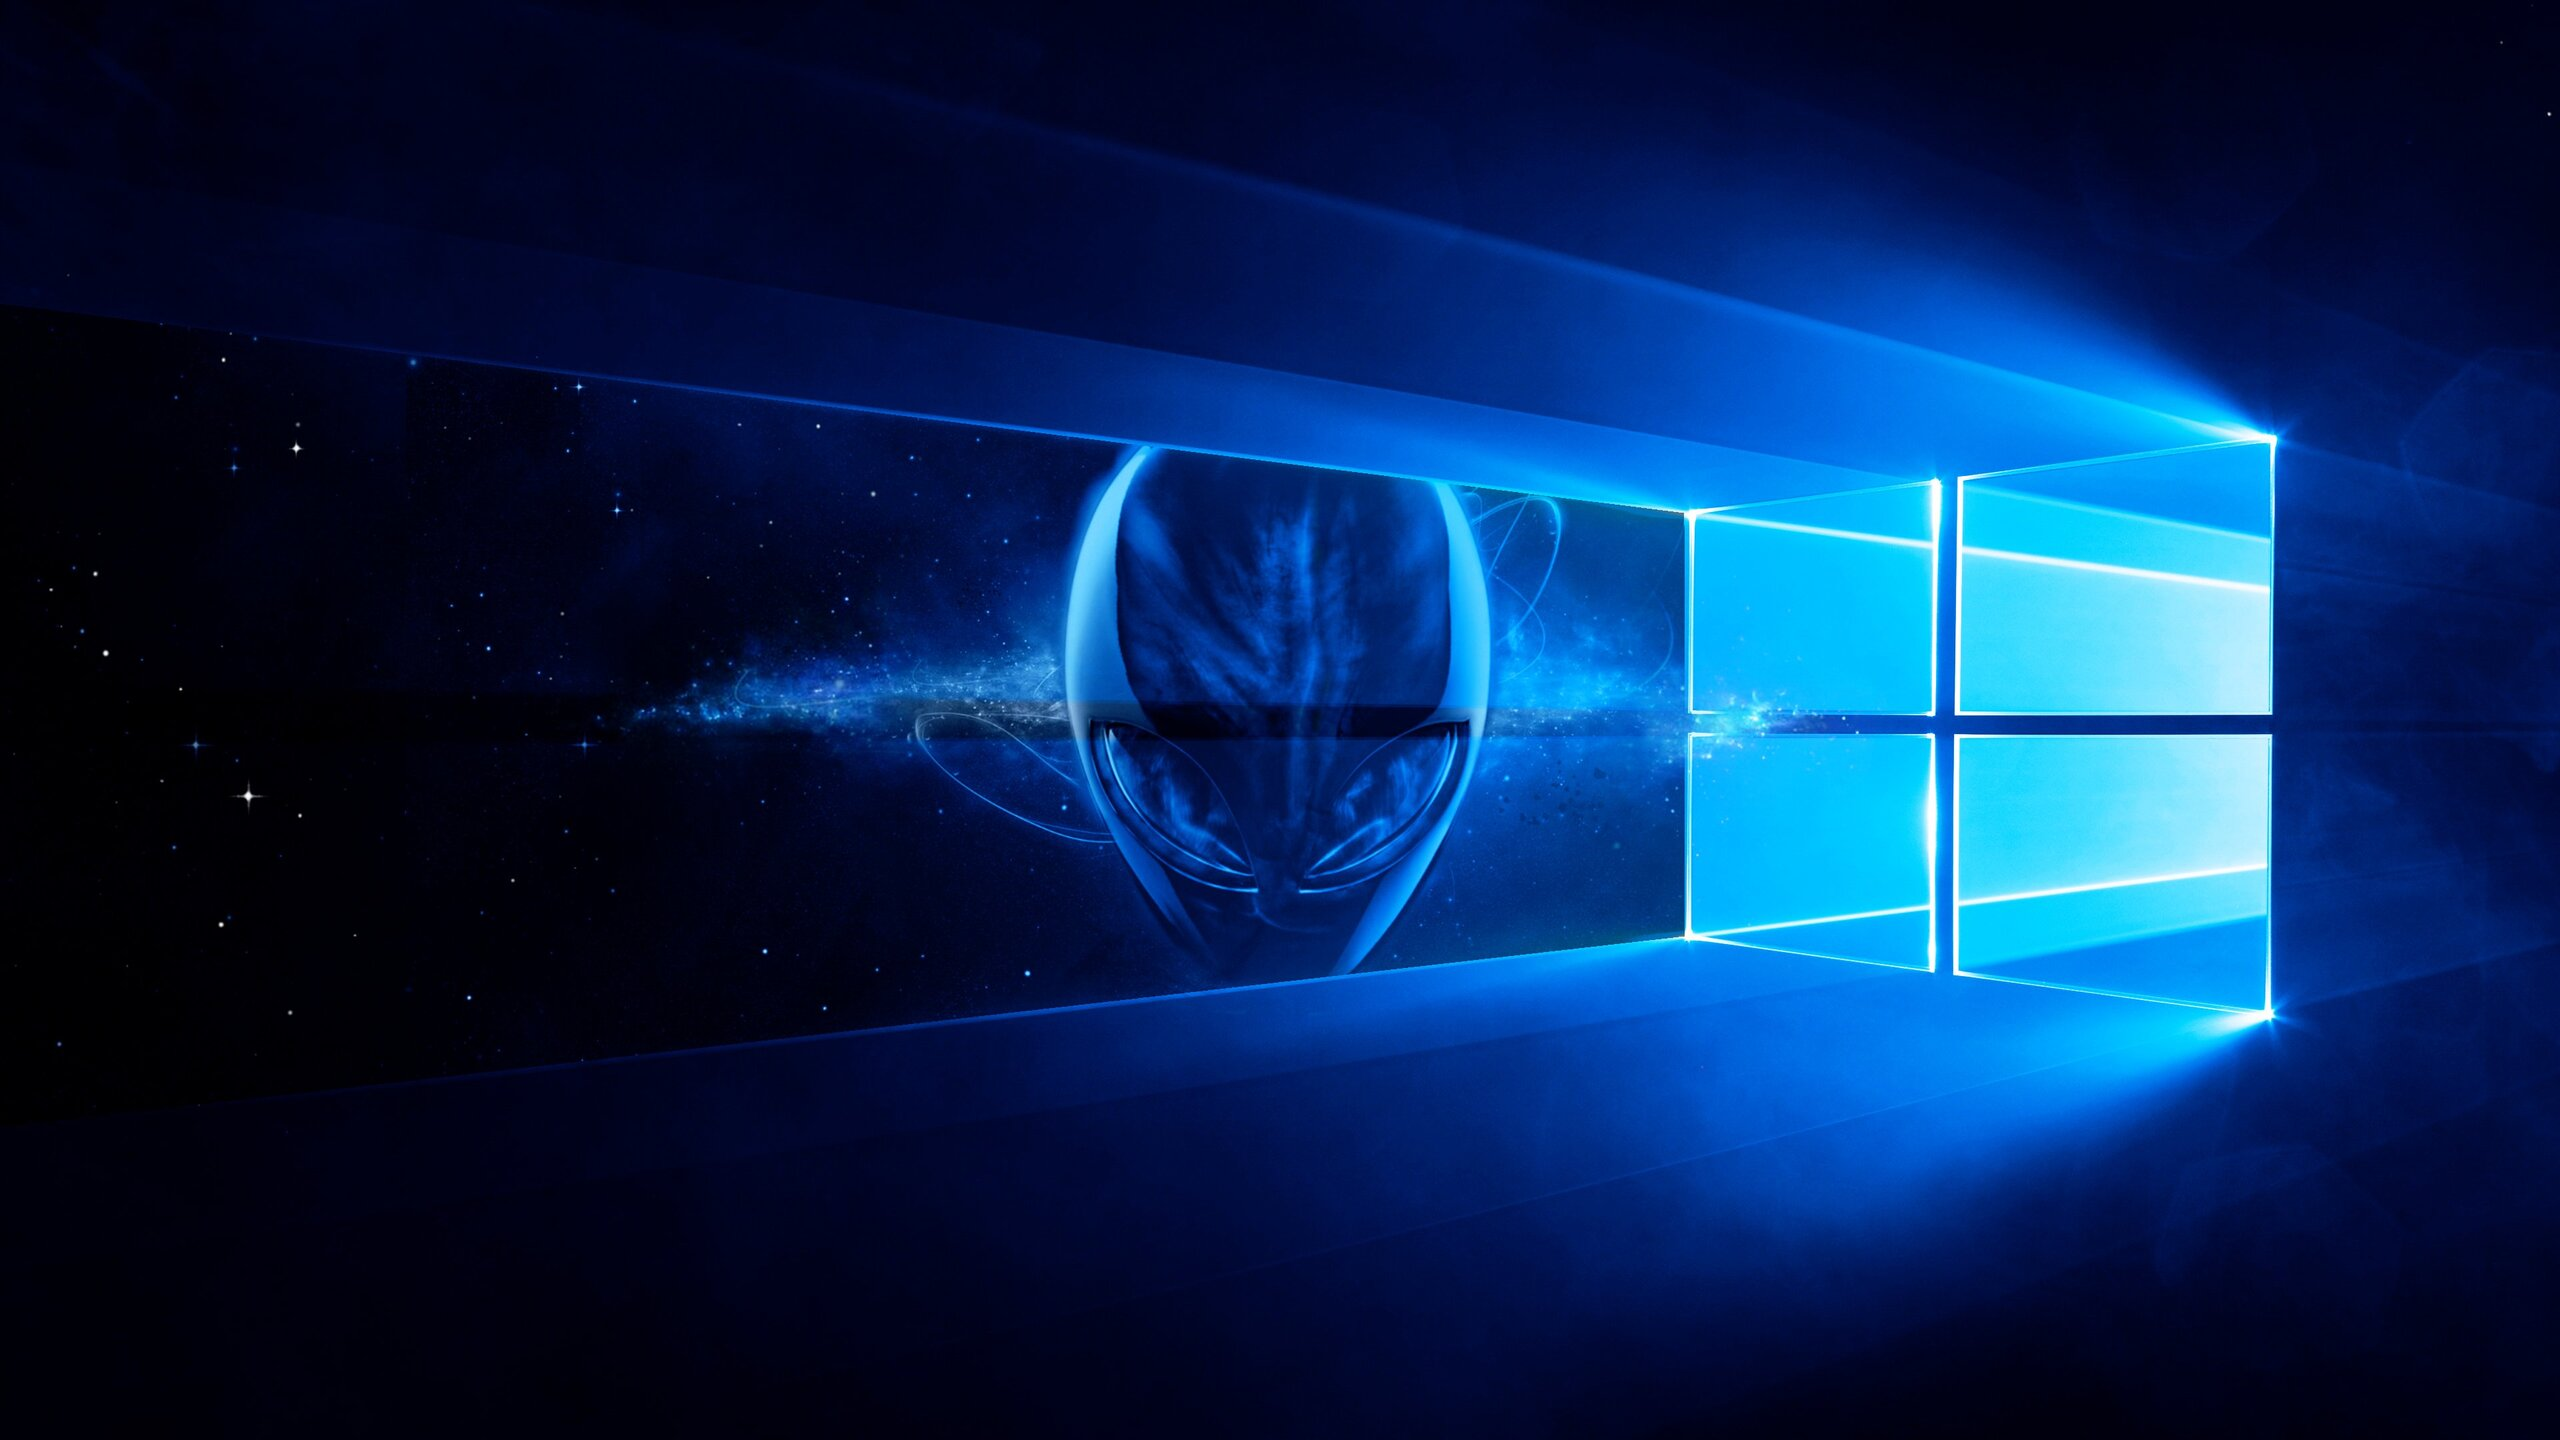 2560x1440 Alienware Windows 10 1440P Resolution HD 4k ...